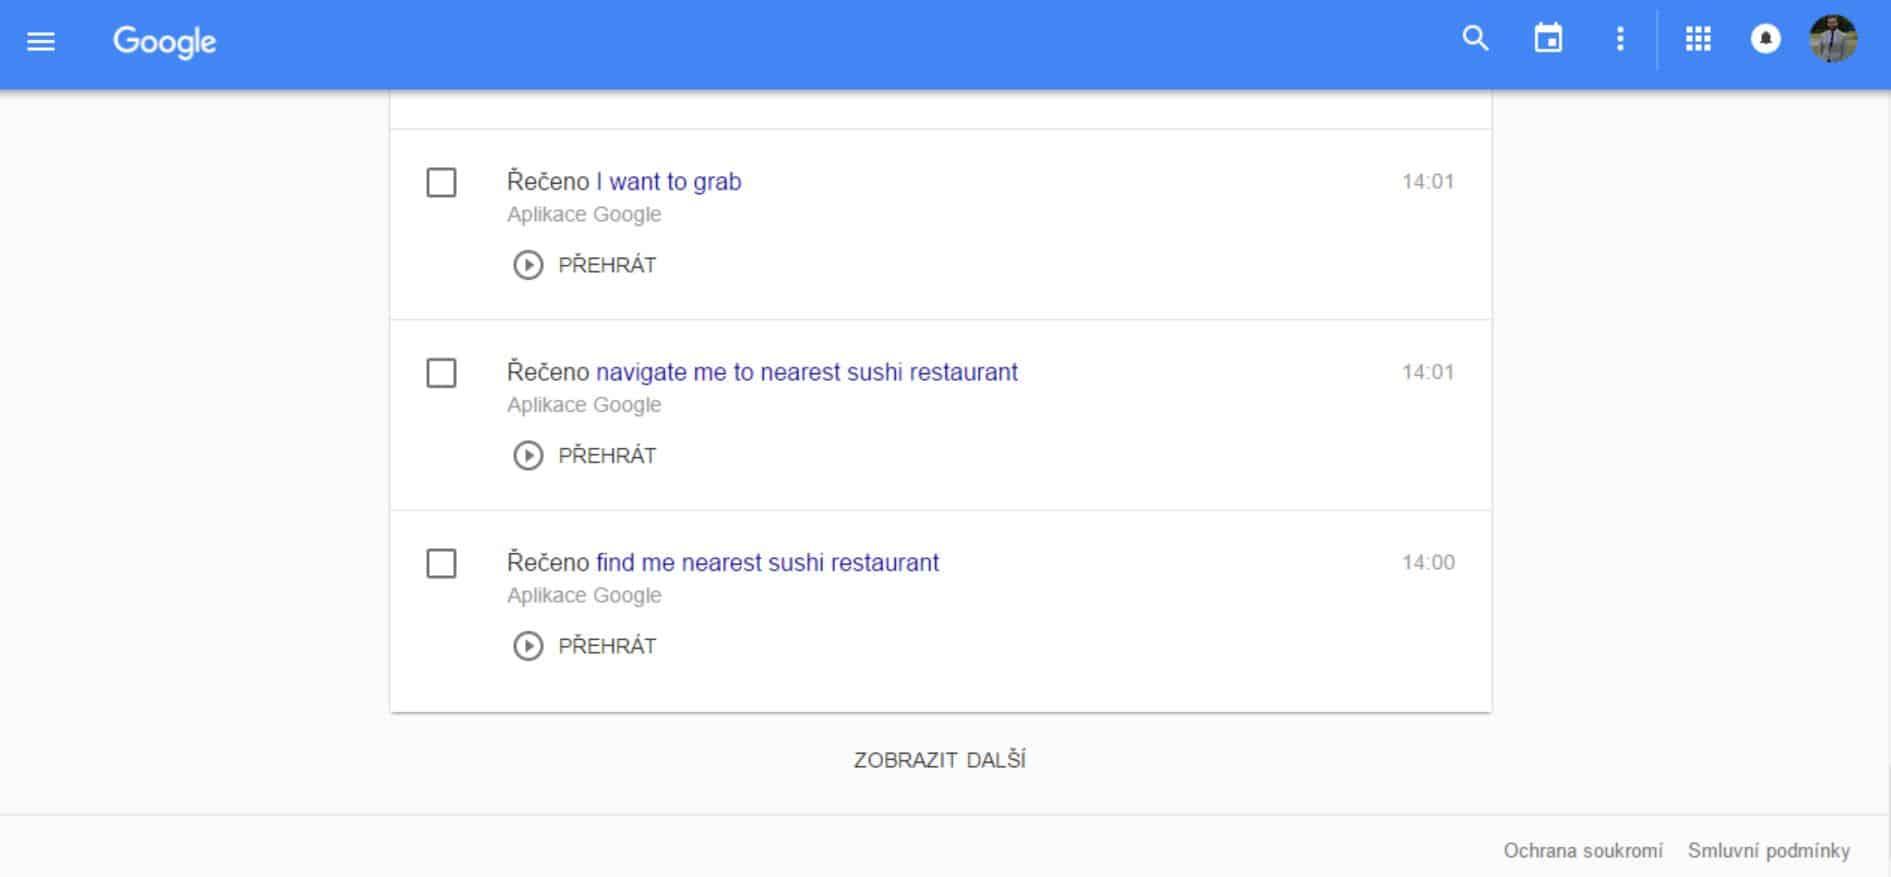 google voice activity